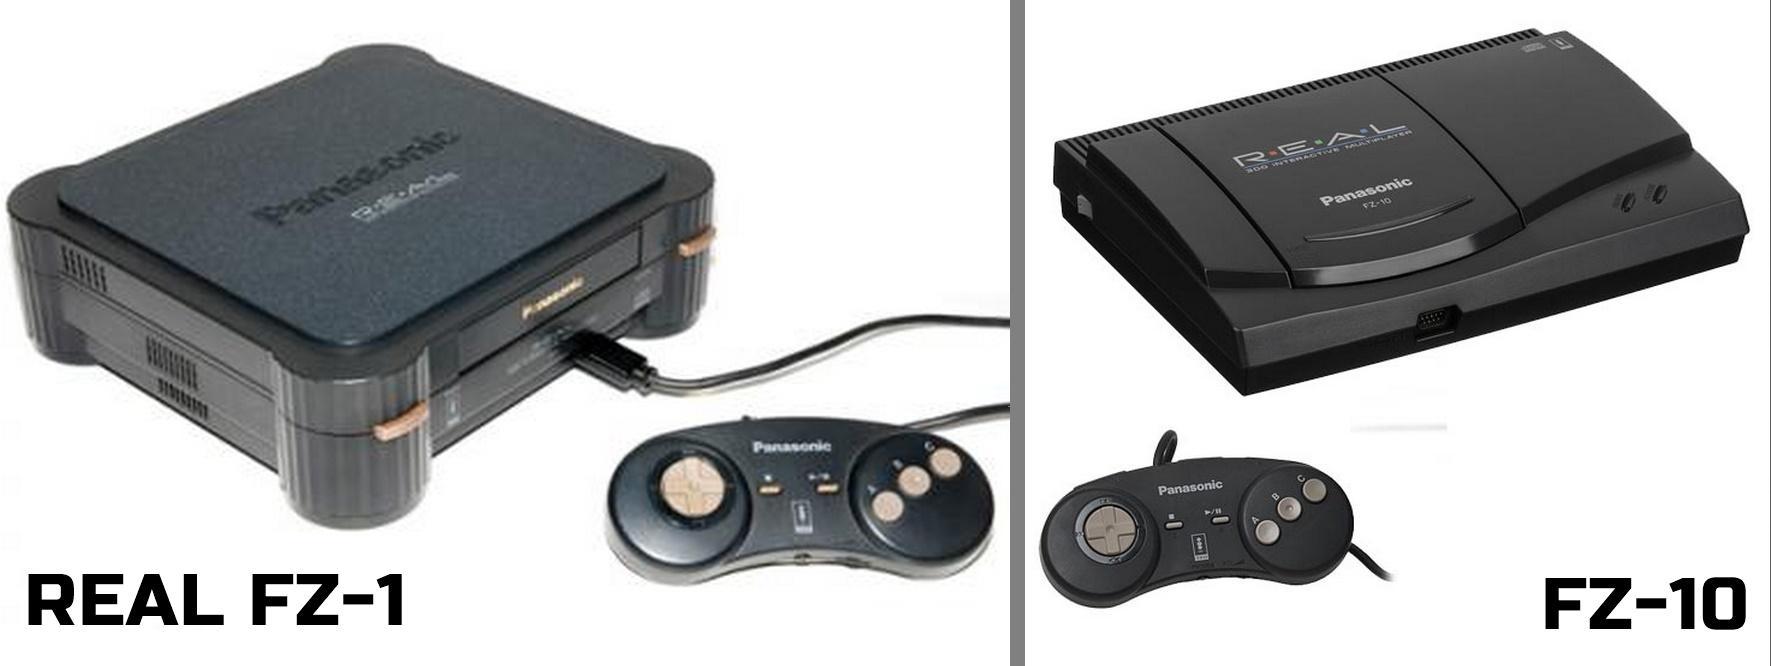 3DO da Panasonic - REAL FZ-1 e FZ-10